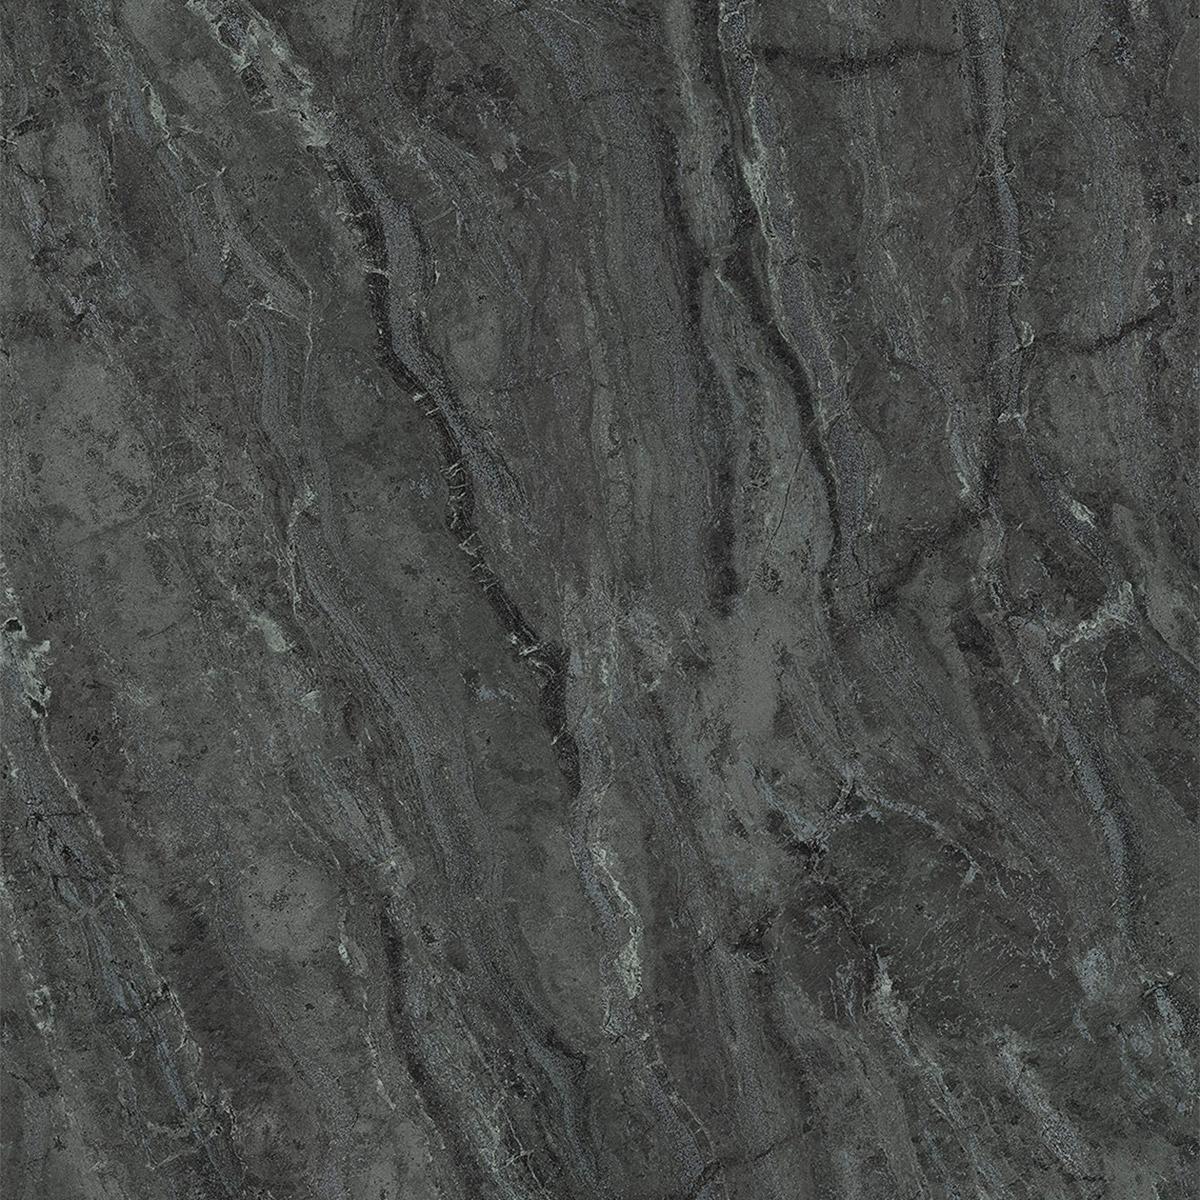 HF1875 Naturstein grau